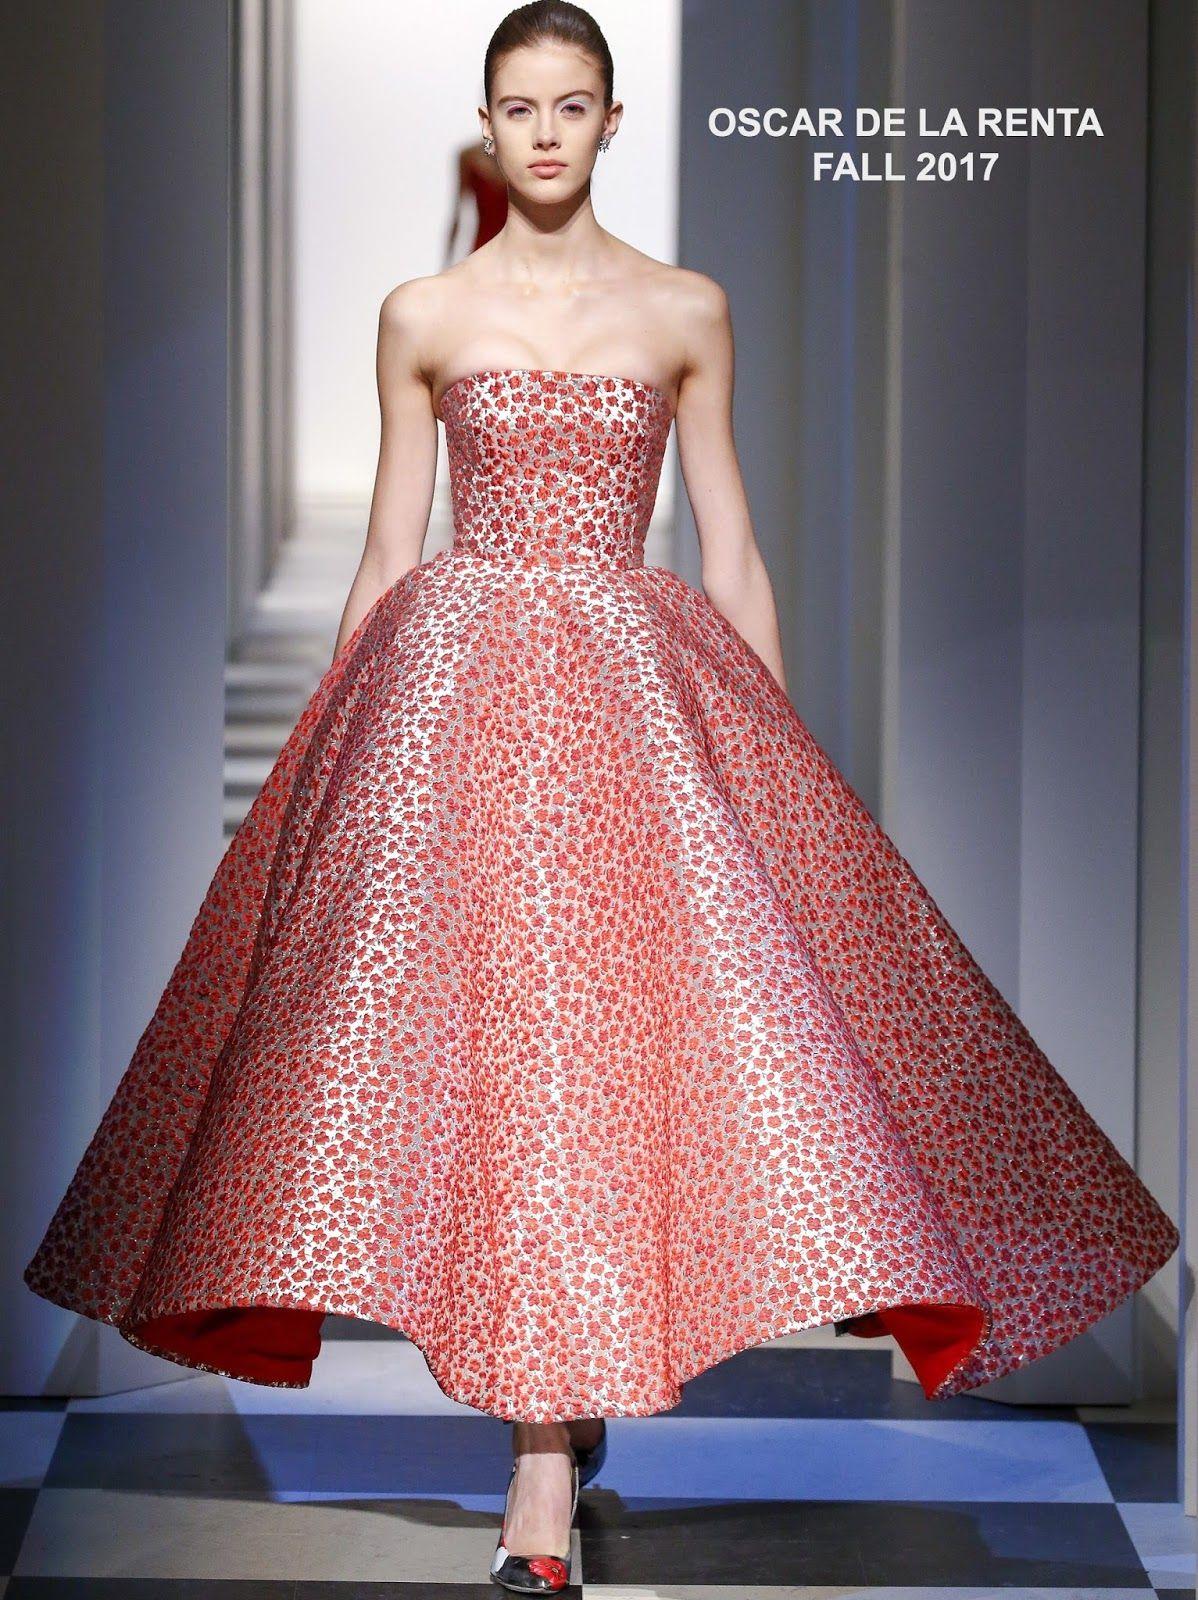 Oscar de la renta poppyjacquard strapless gown womenus fashion of